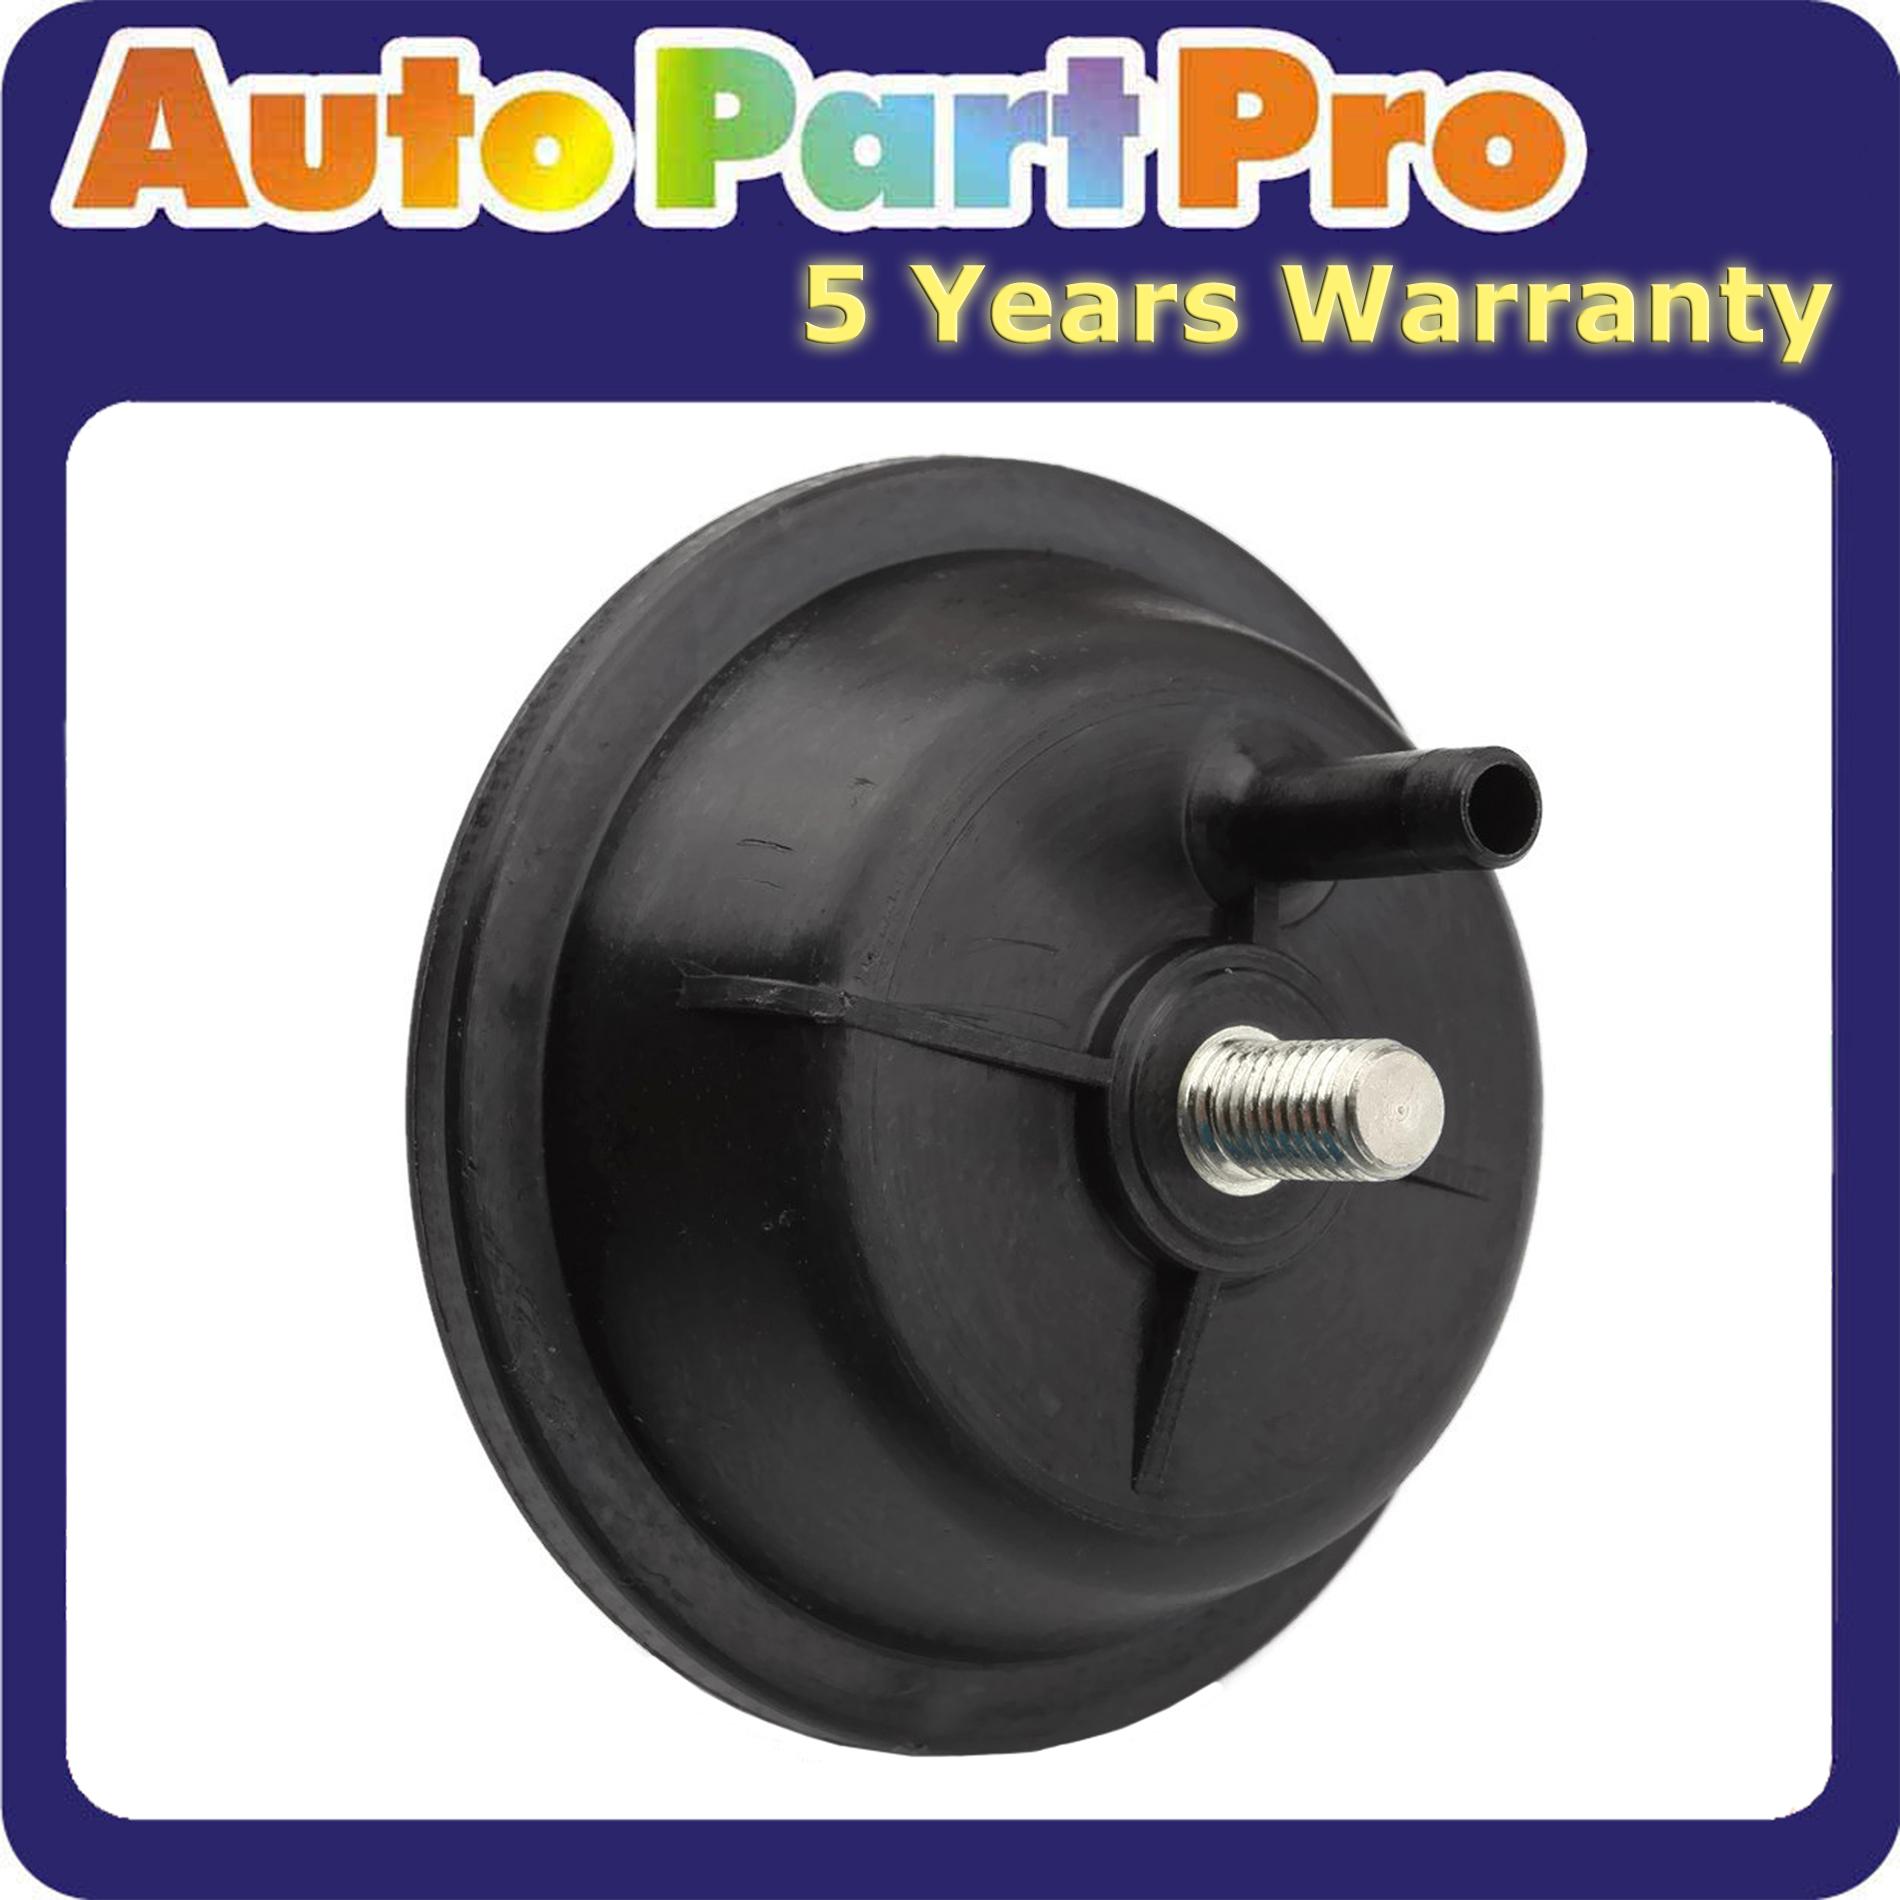 For Audi A6 A8 VW Phaeton Set 2pcs Intake Manifold Actuator Vacuum Diaphragm New